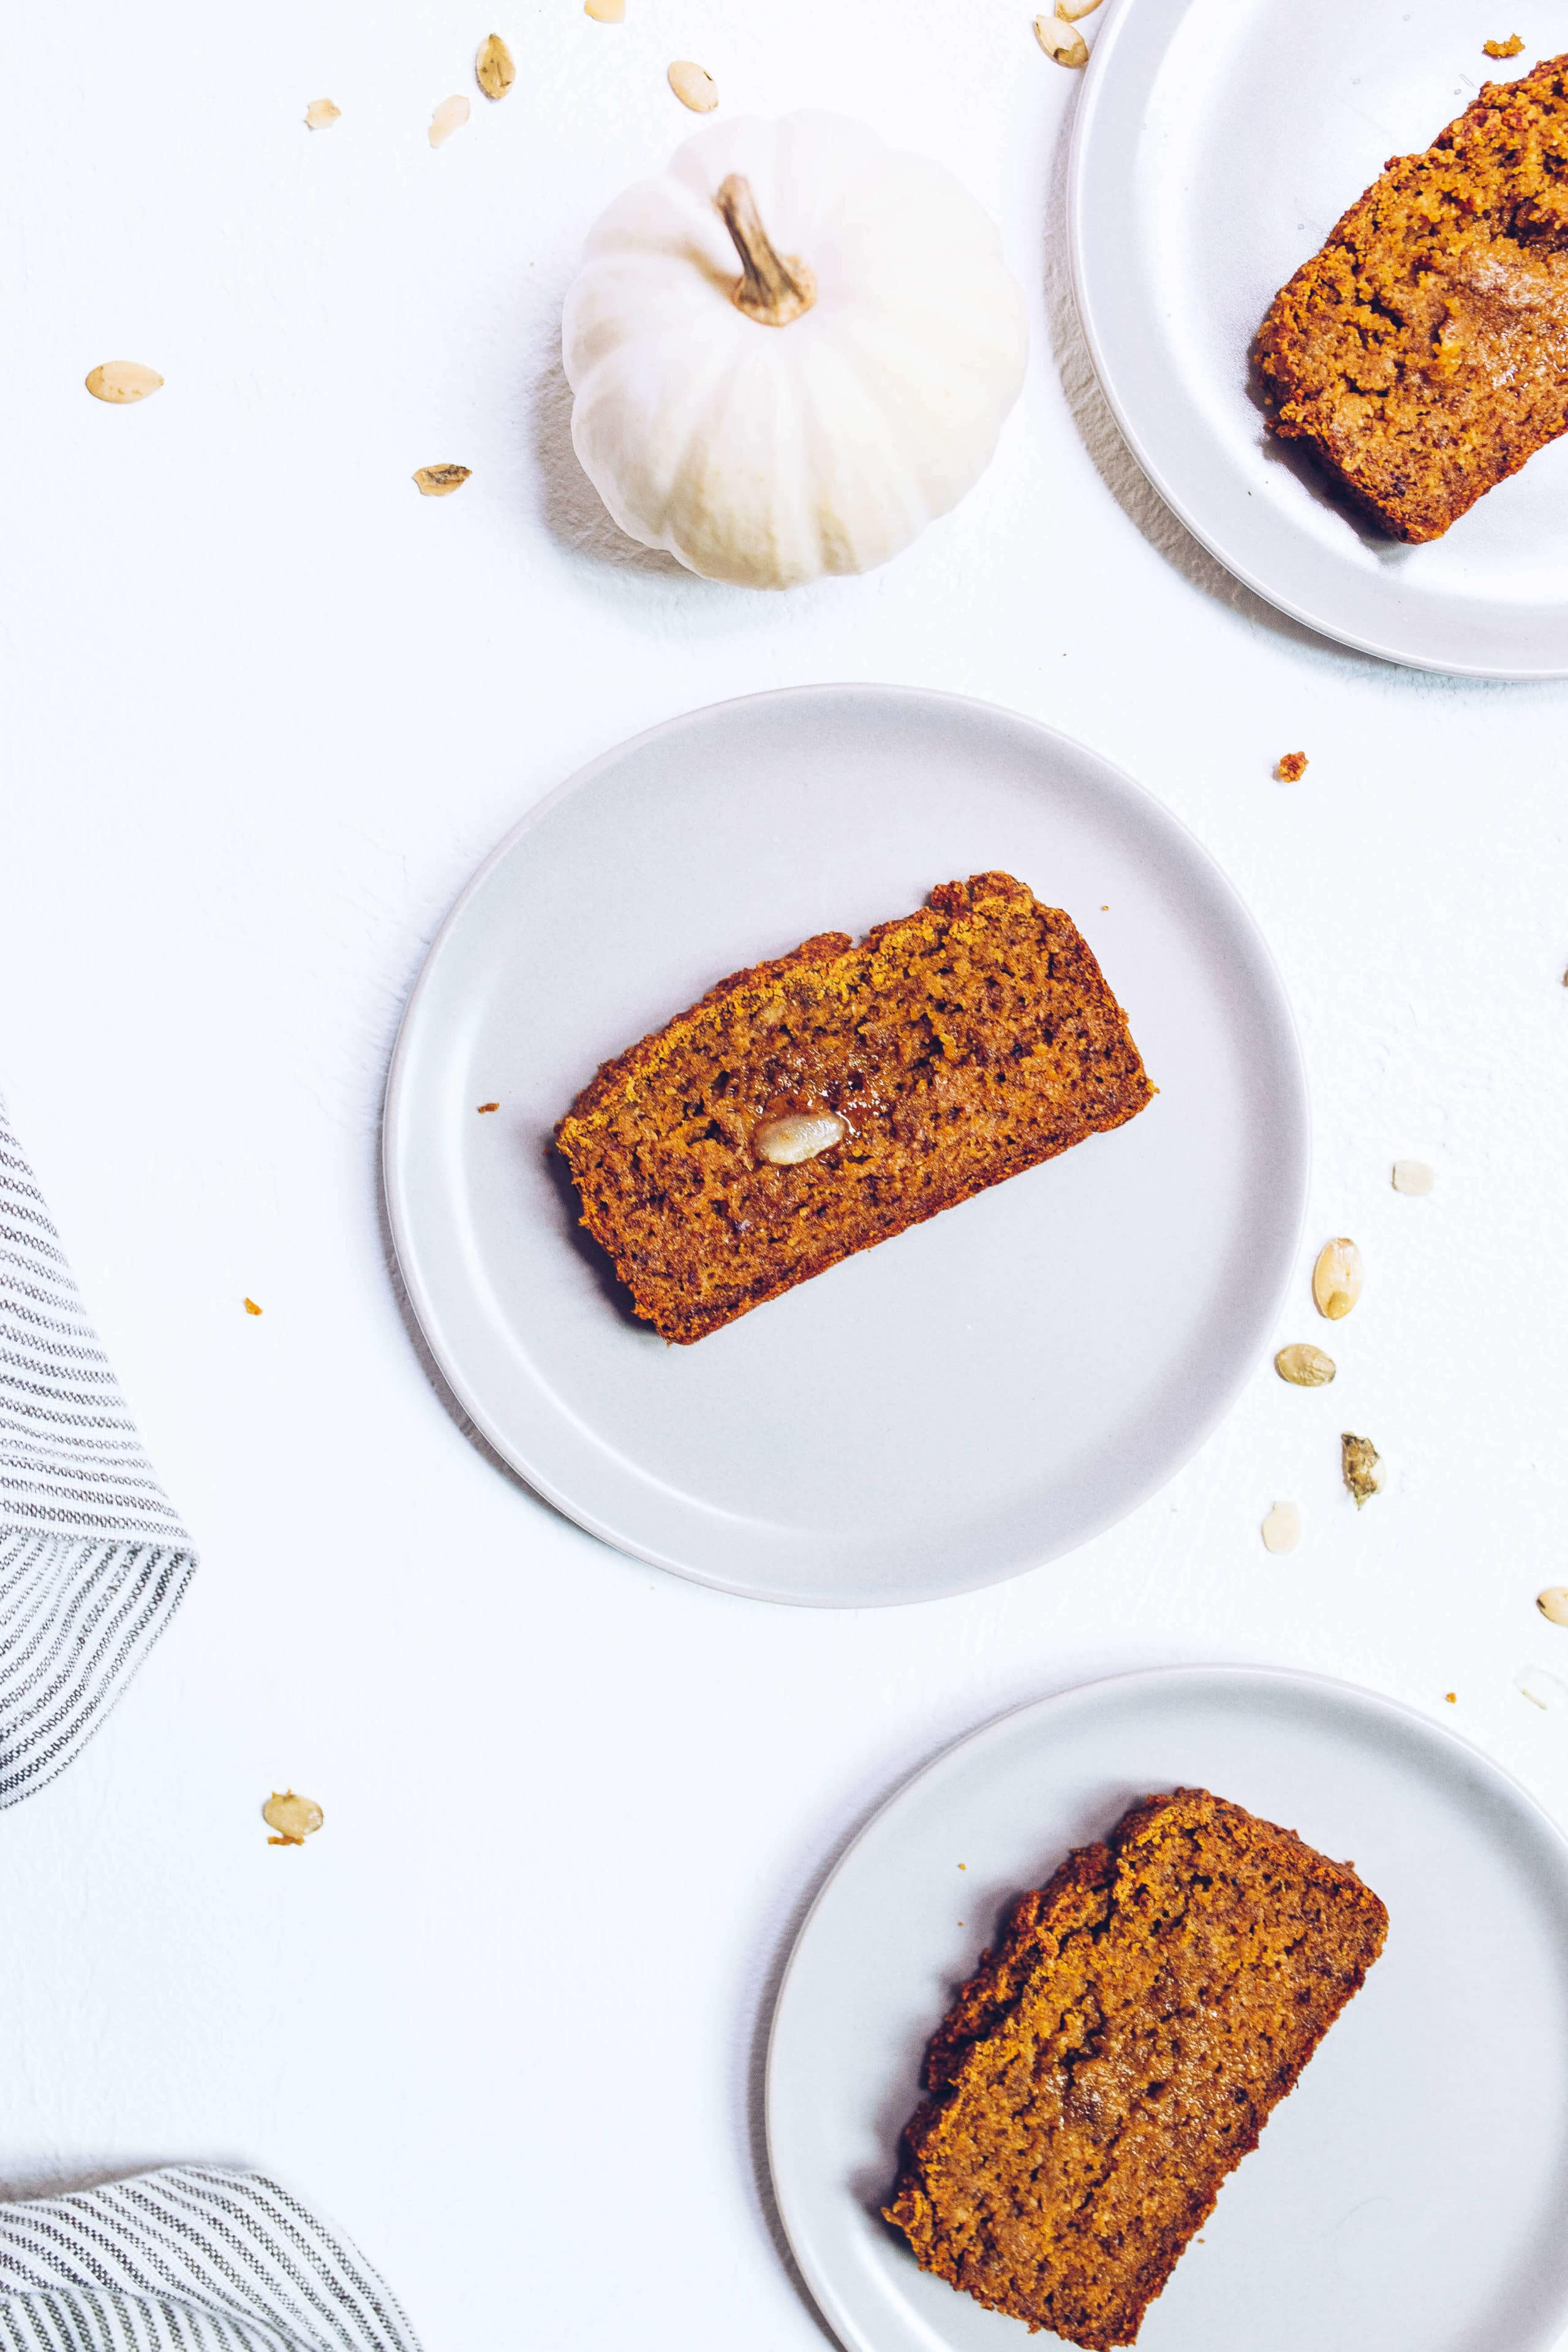 Paleo Pumpkin Banana Bread (refined sugar-free, gluten-free, grain-free) via Food by Mars